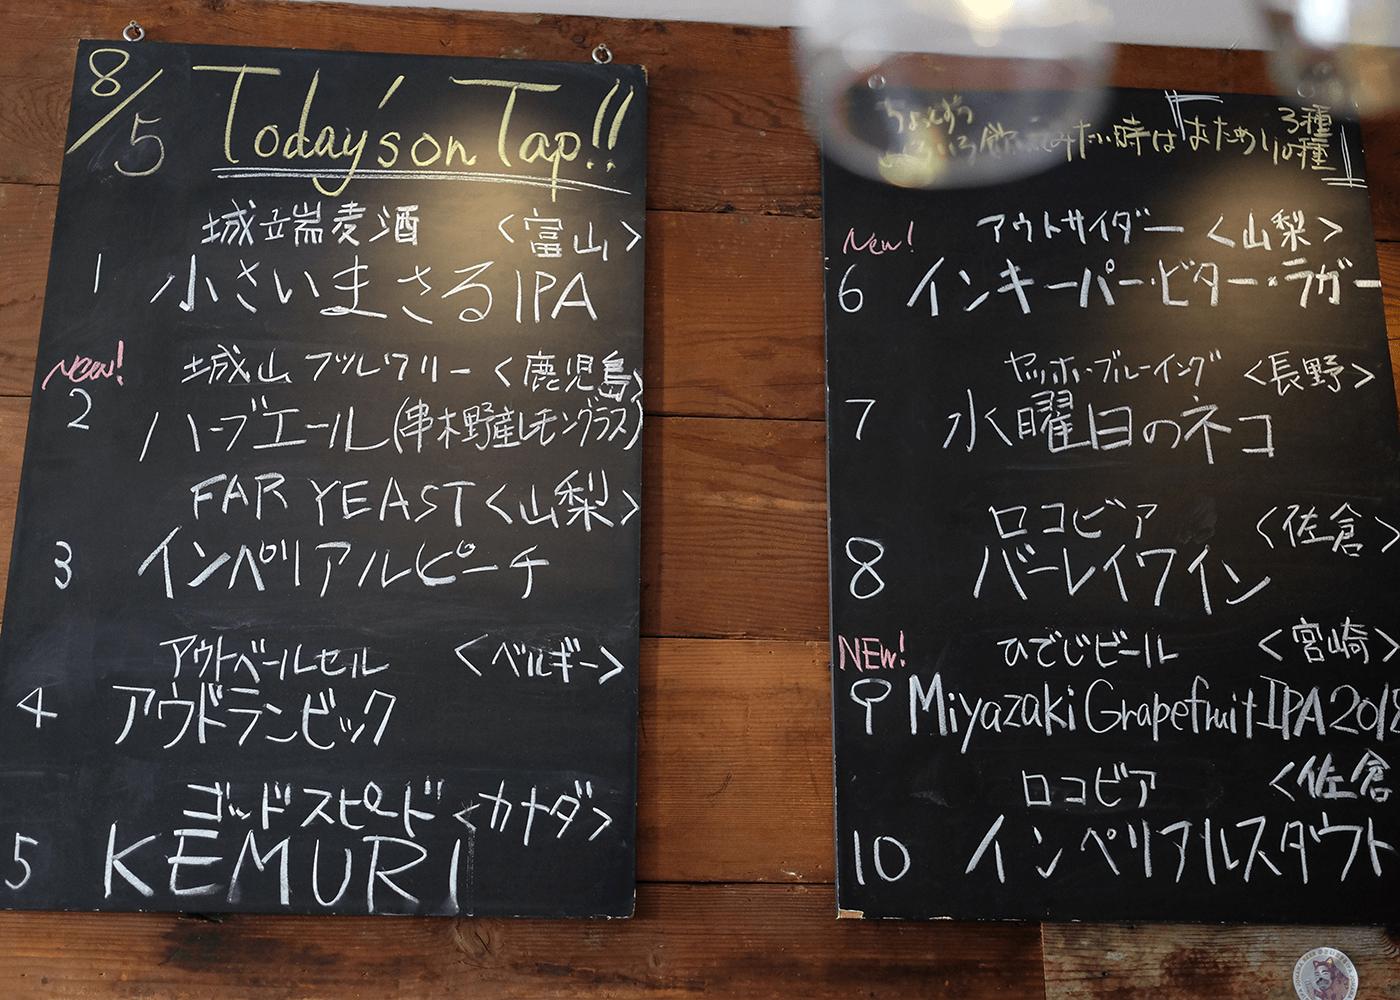 Beer O'clock(ビアオクロック)